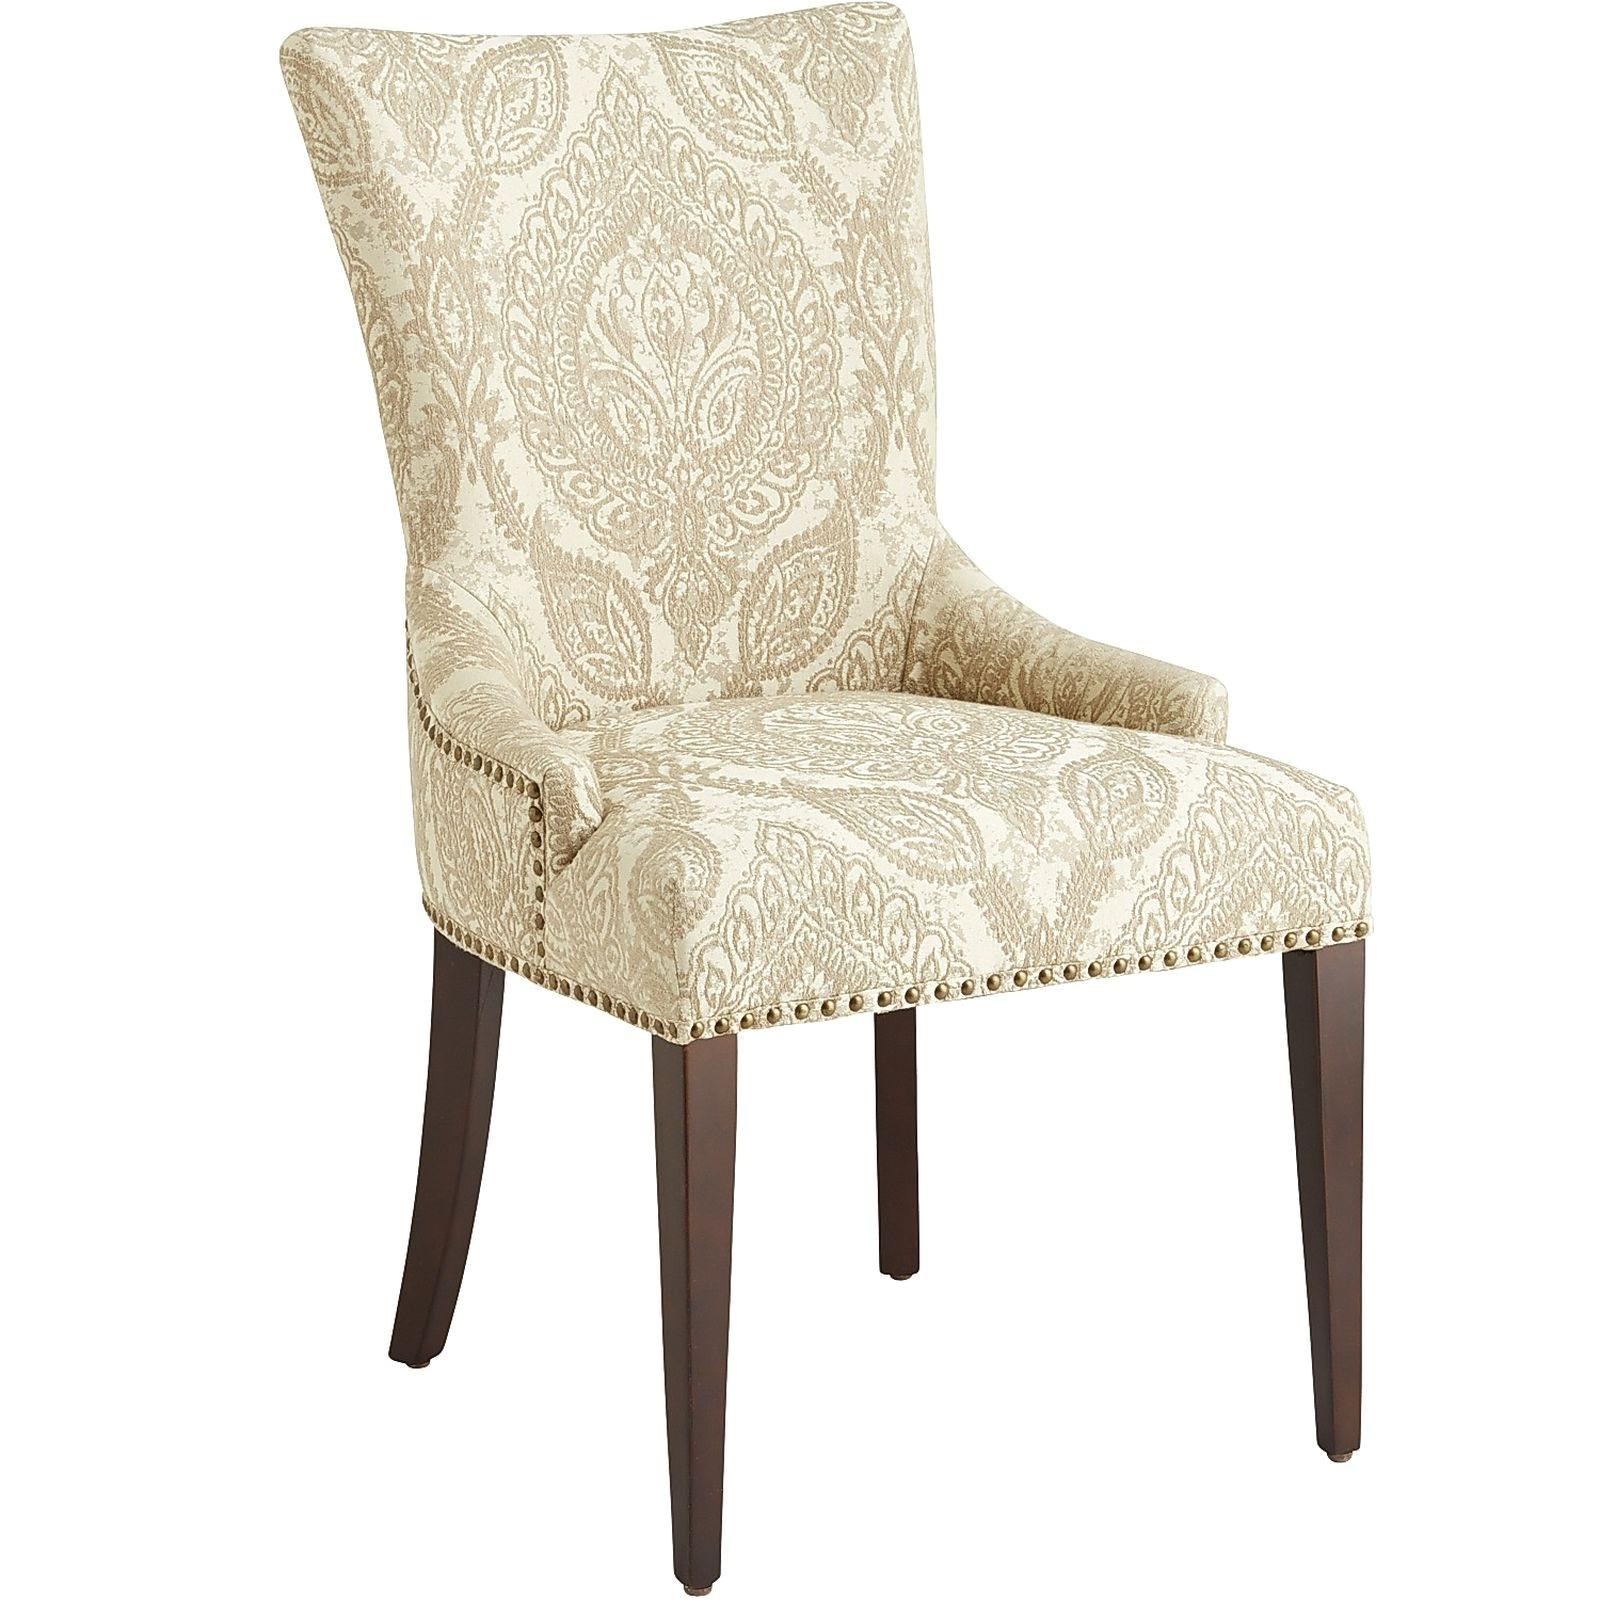 Navy Nailhead Parsons Chair Adelle Khaki Dining Chair Nailhead Trim Dining Chairs and Antique